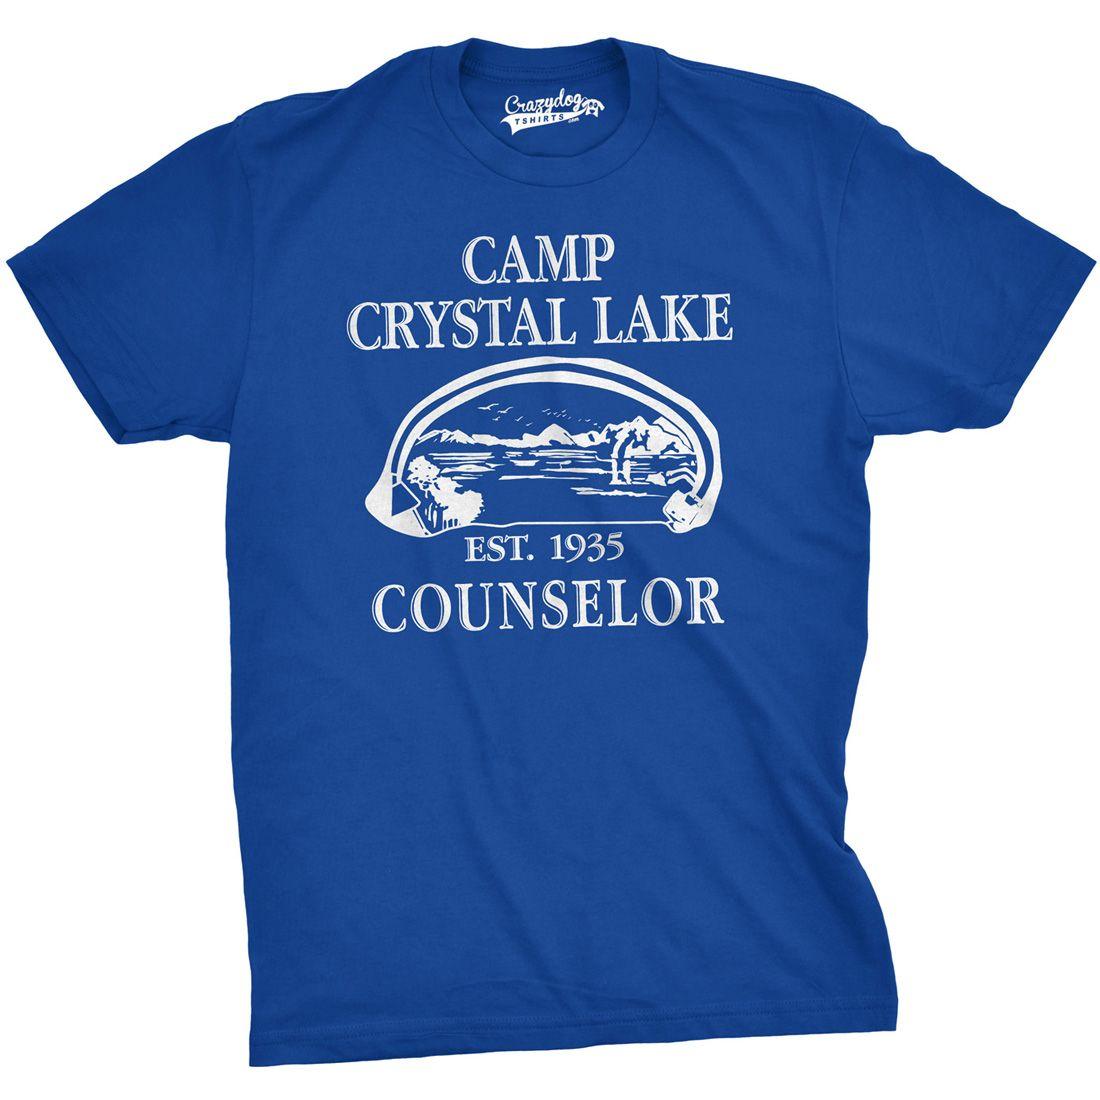 05081e94fc37 Camp Crystal Lake Men's Tshirt | Get Outside | Horror movie t shirts ...